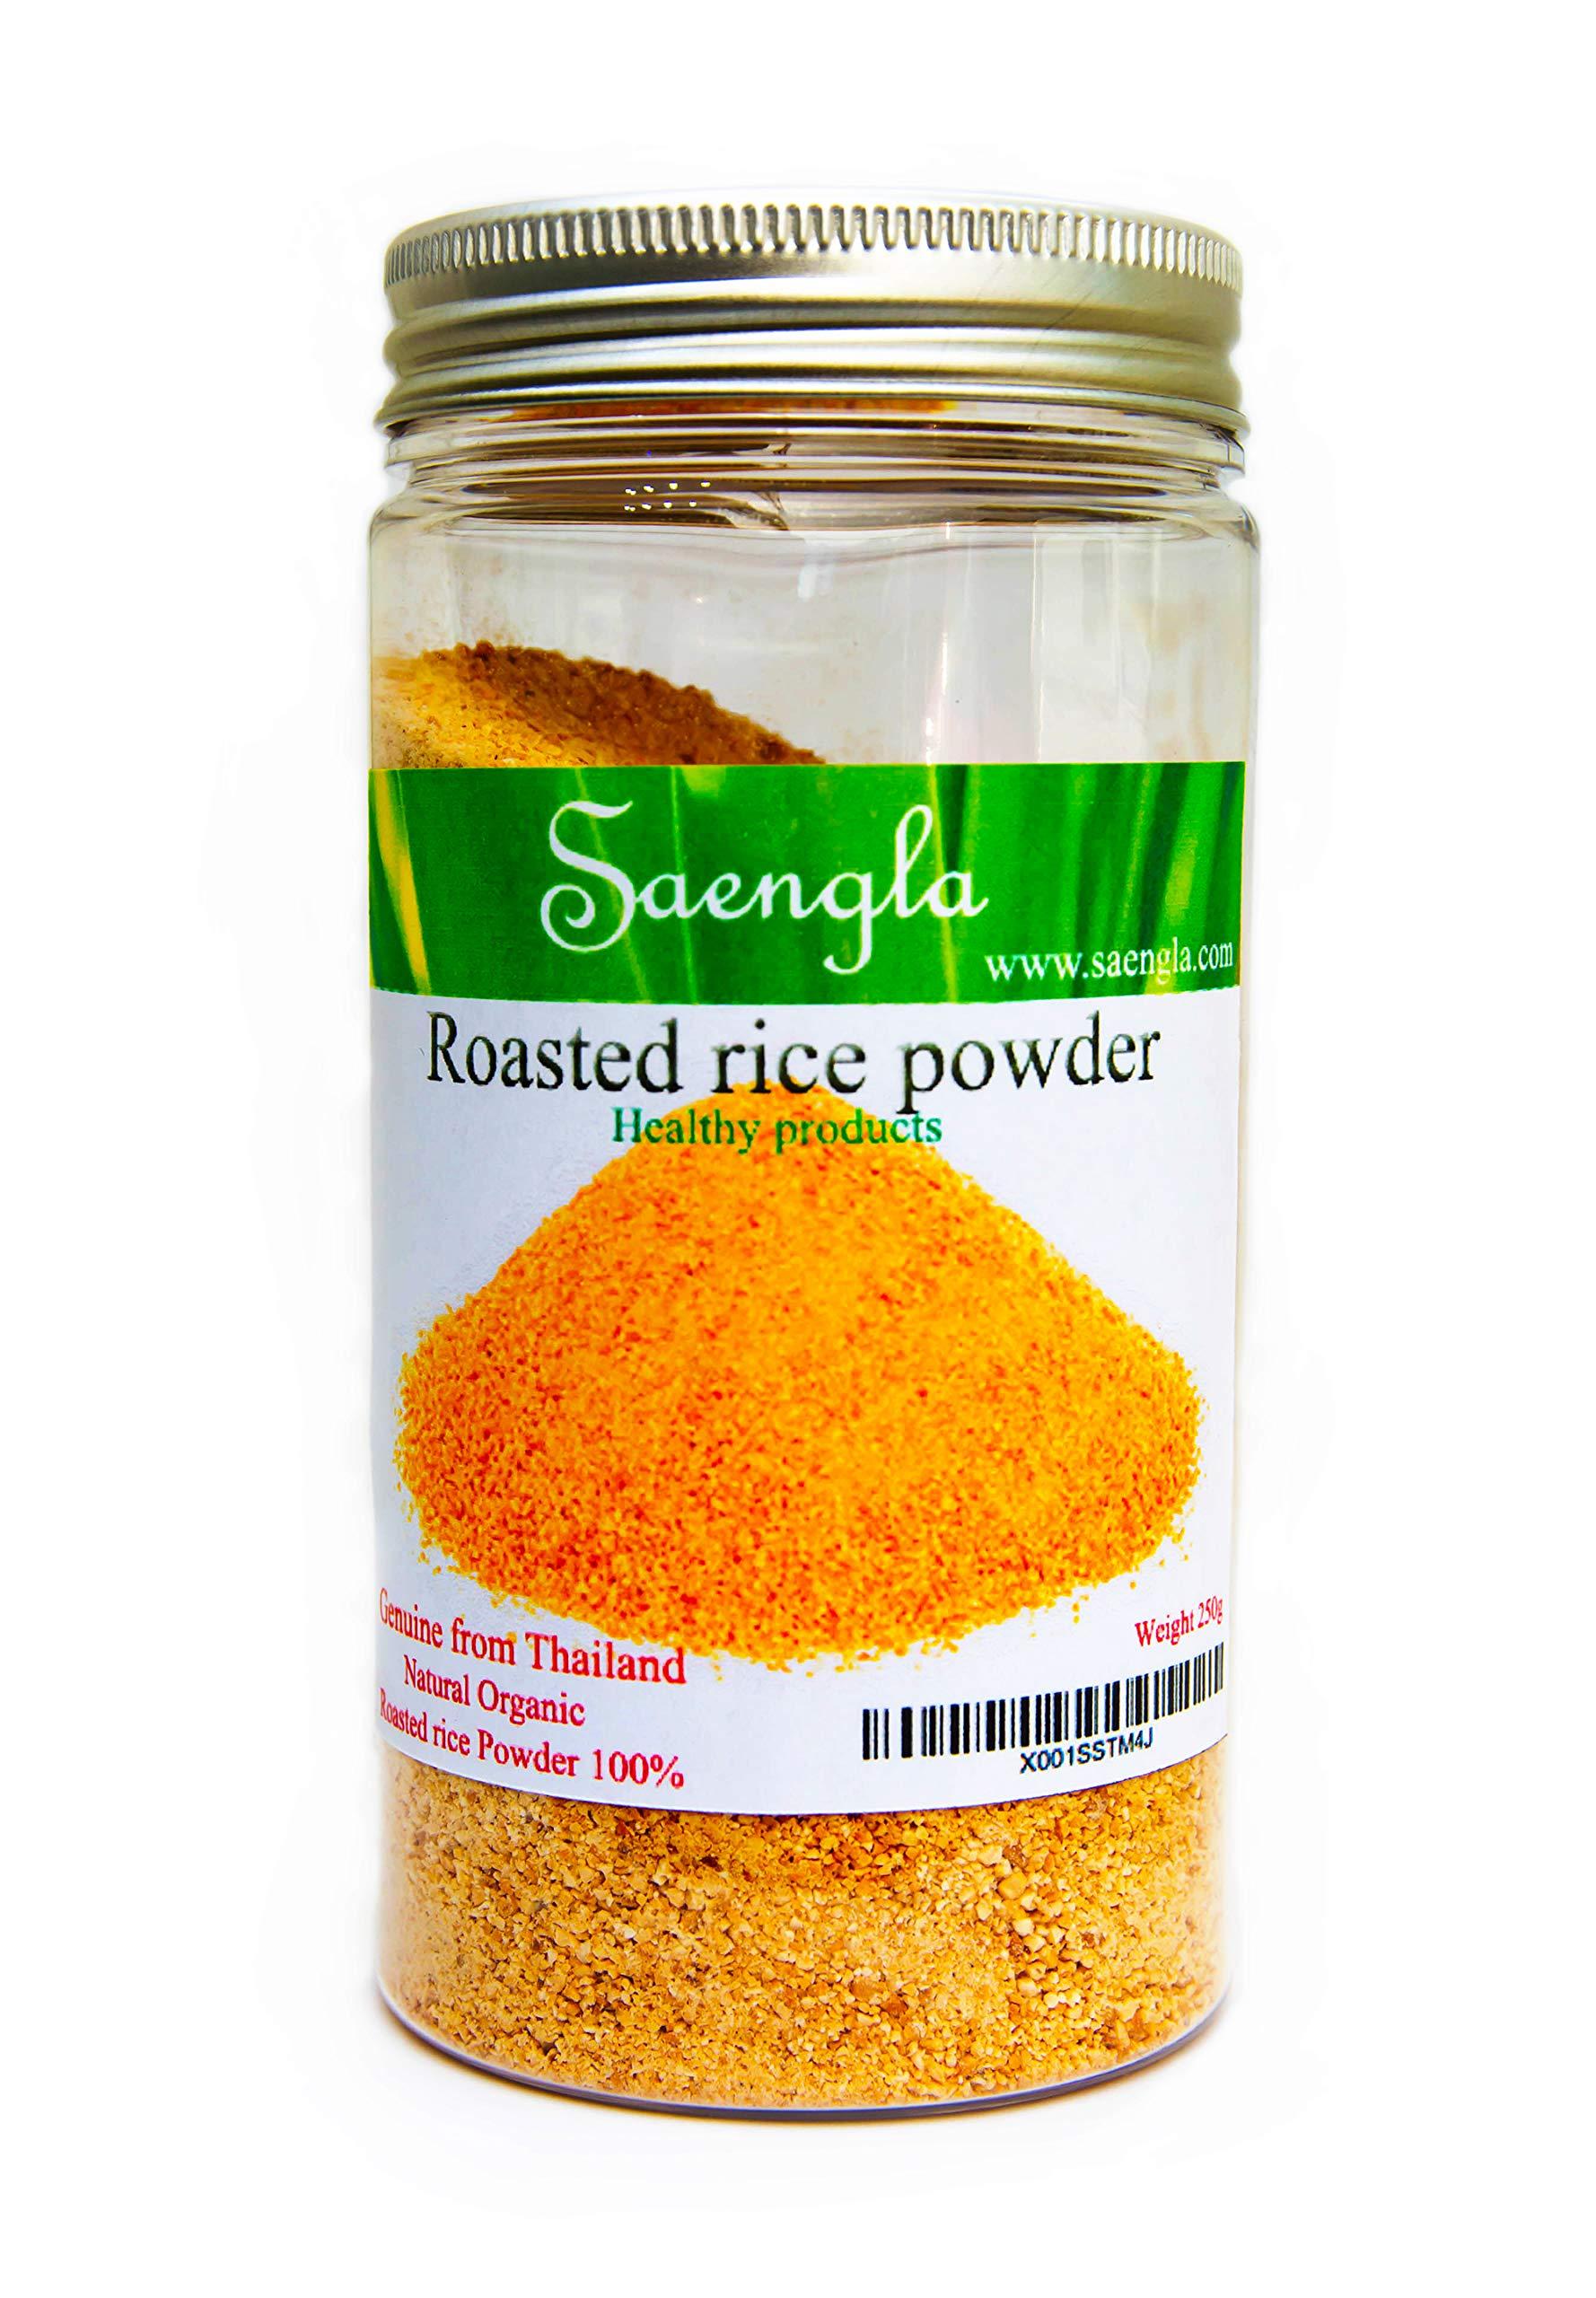 Saengla Roasted rice powder organic naturel. 300g